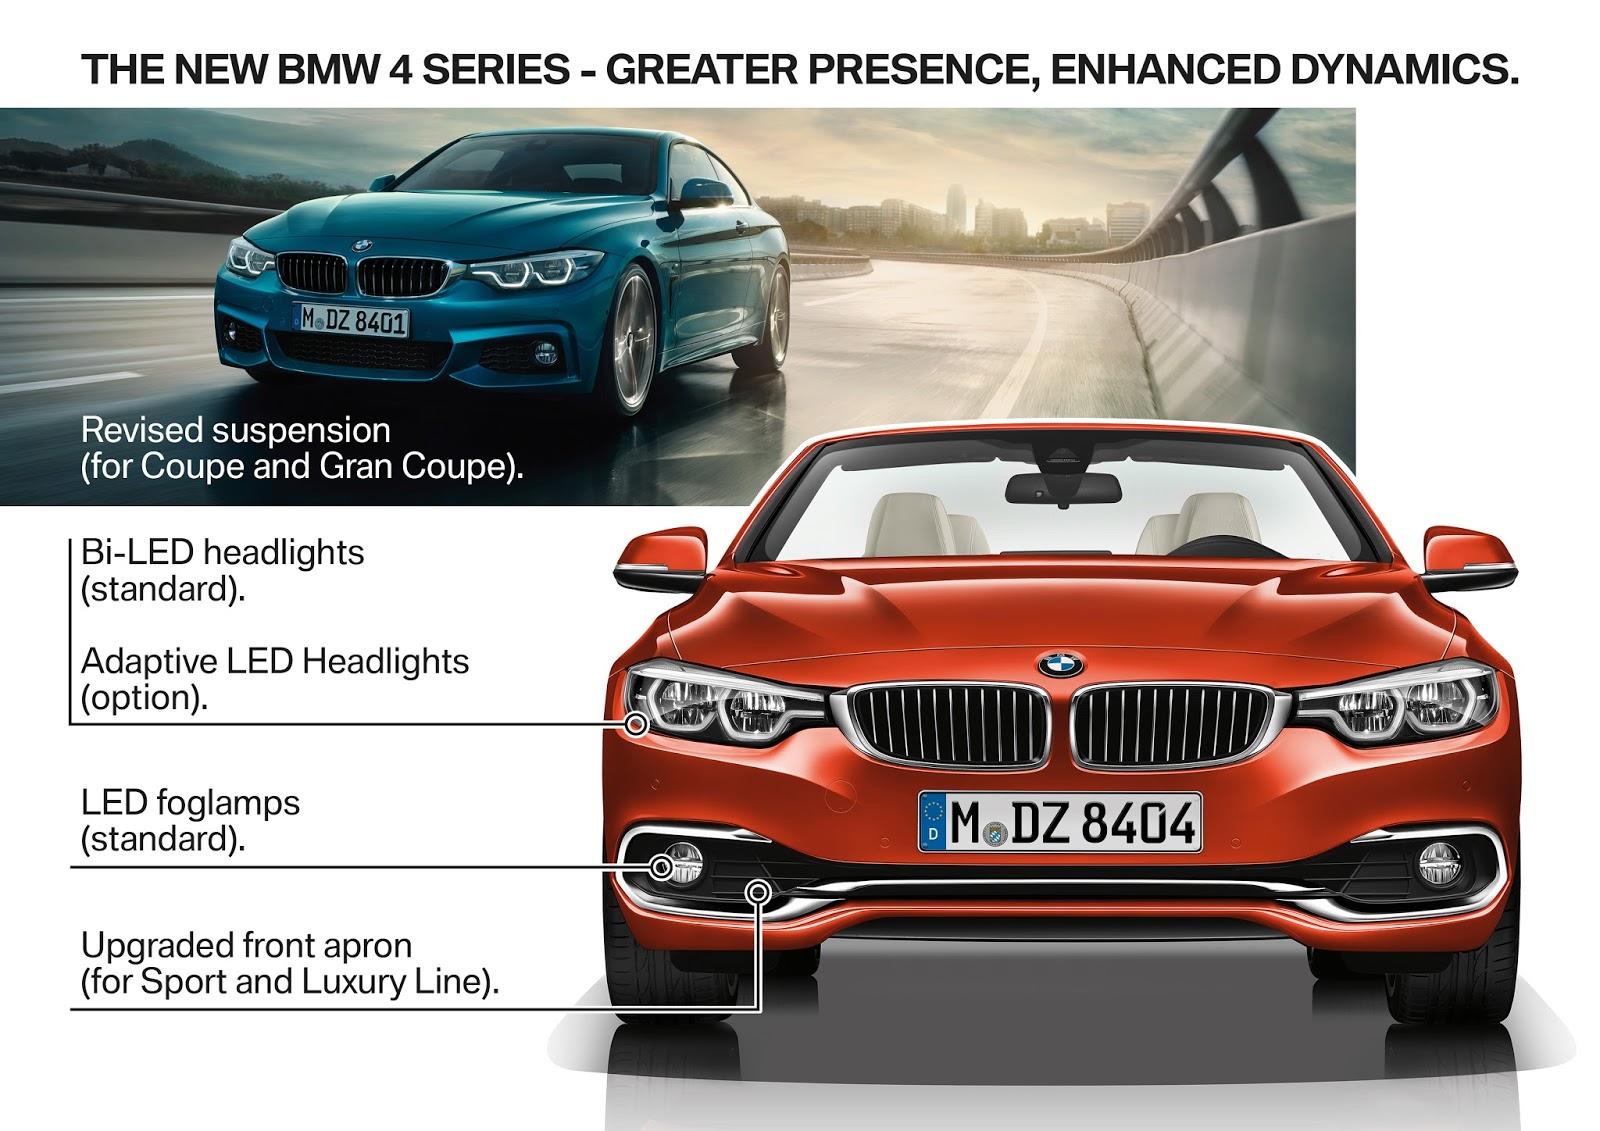 P90245356 highRes the new bmw 4 series Η νέα BMW Σειρά 4, με πιο σφιχτή ρύθμιση ανάρτησης BMW, Bmw 4, BMW 4 Cabrio, BMW 4 Coupe, BMW 4 Gran Coupé, Facelift